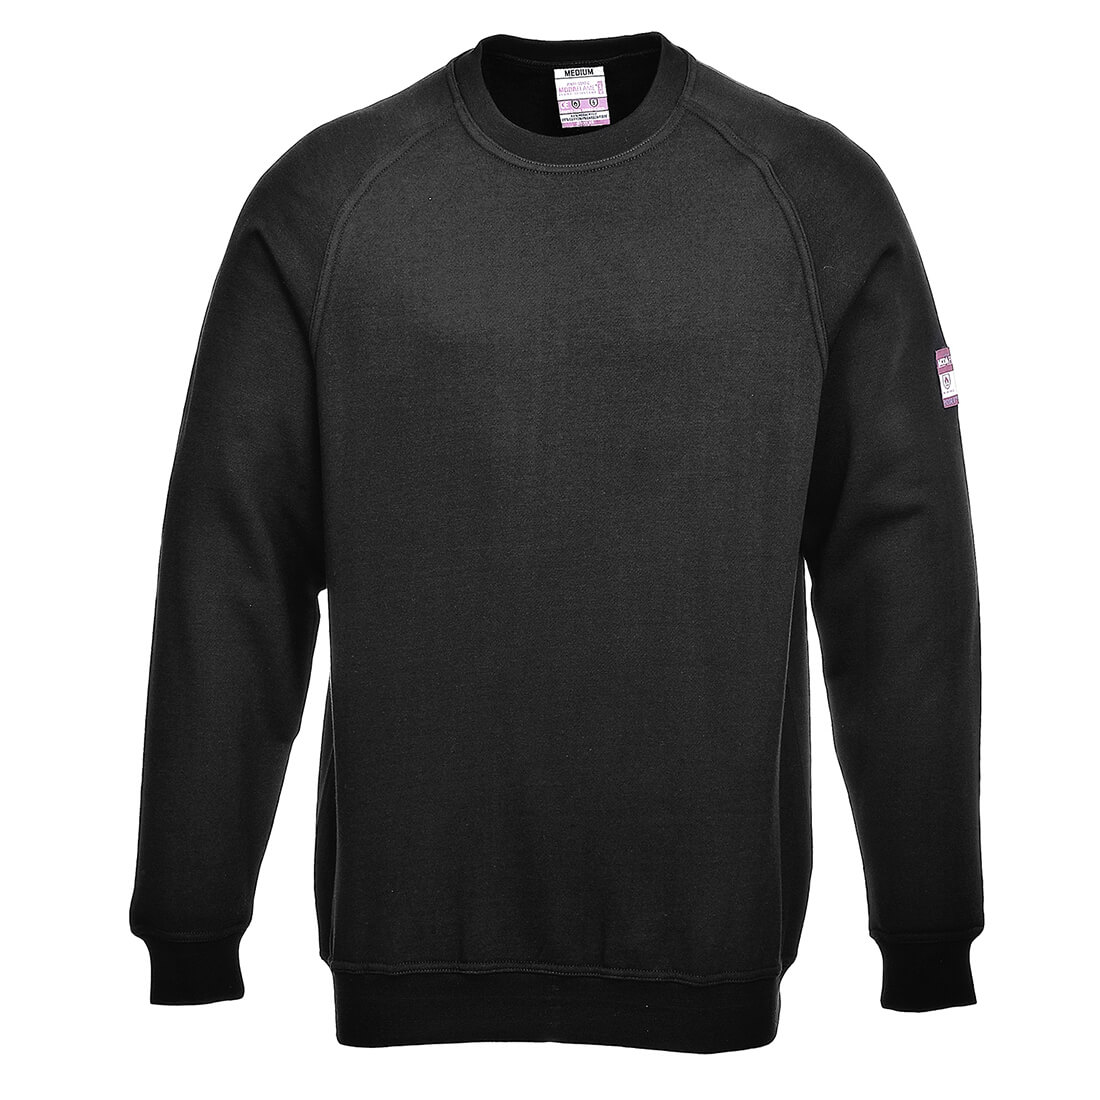 Image of Modaflame Mens Flame Resistant Antistatic Long Sleeve Sweatshirt Black 2XL